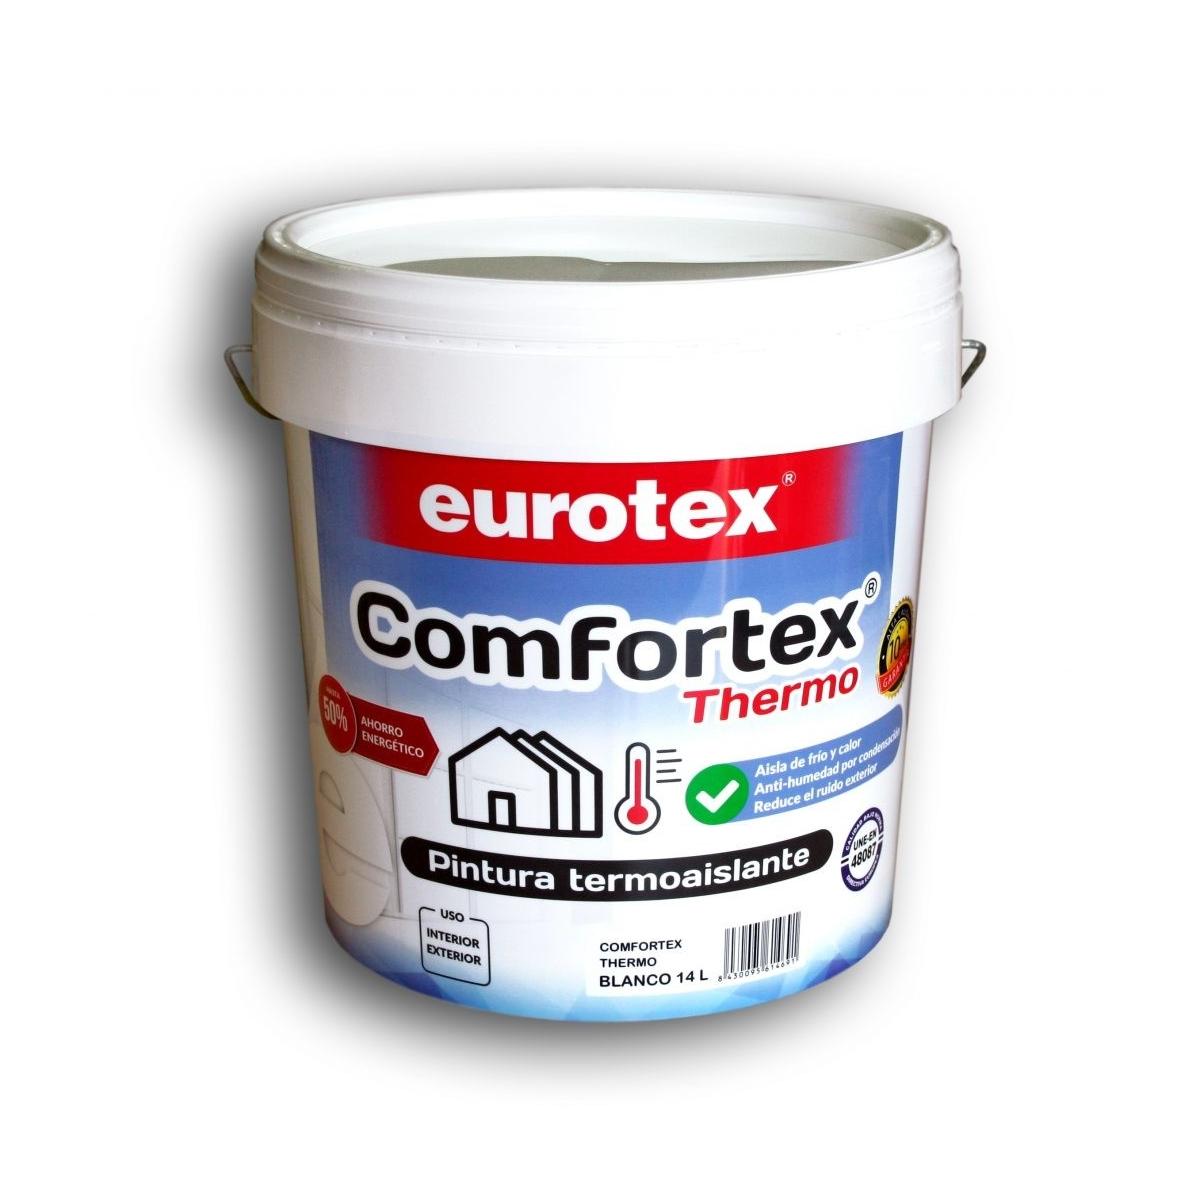 Comfortex Thermo Blanca 14 Litros